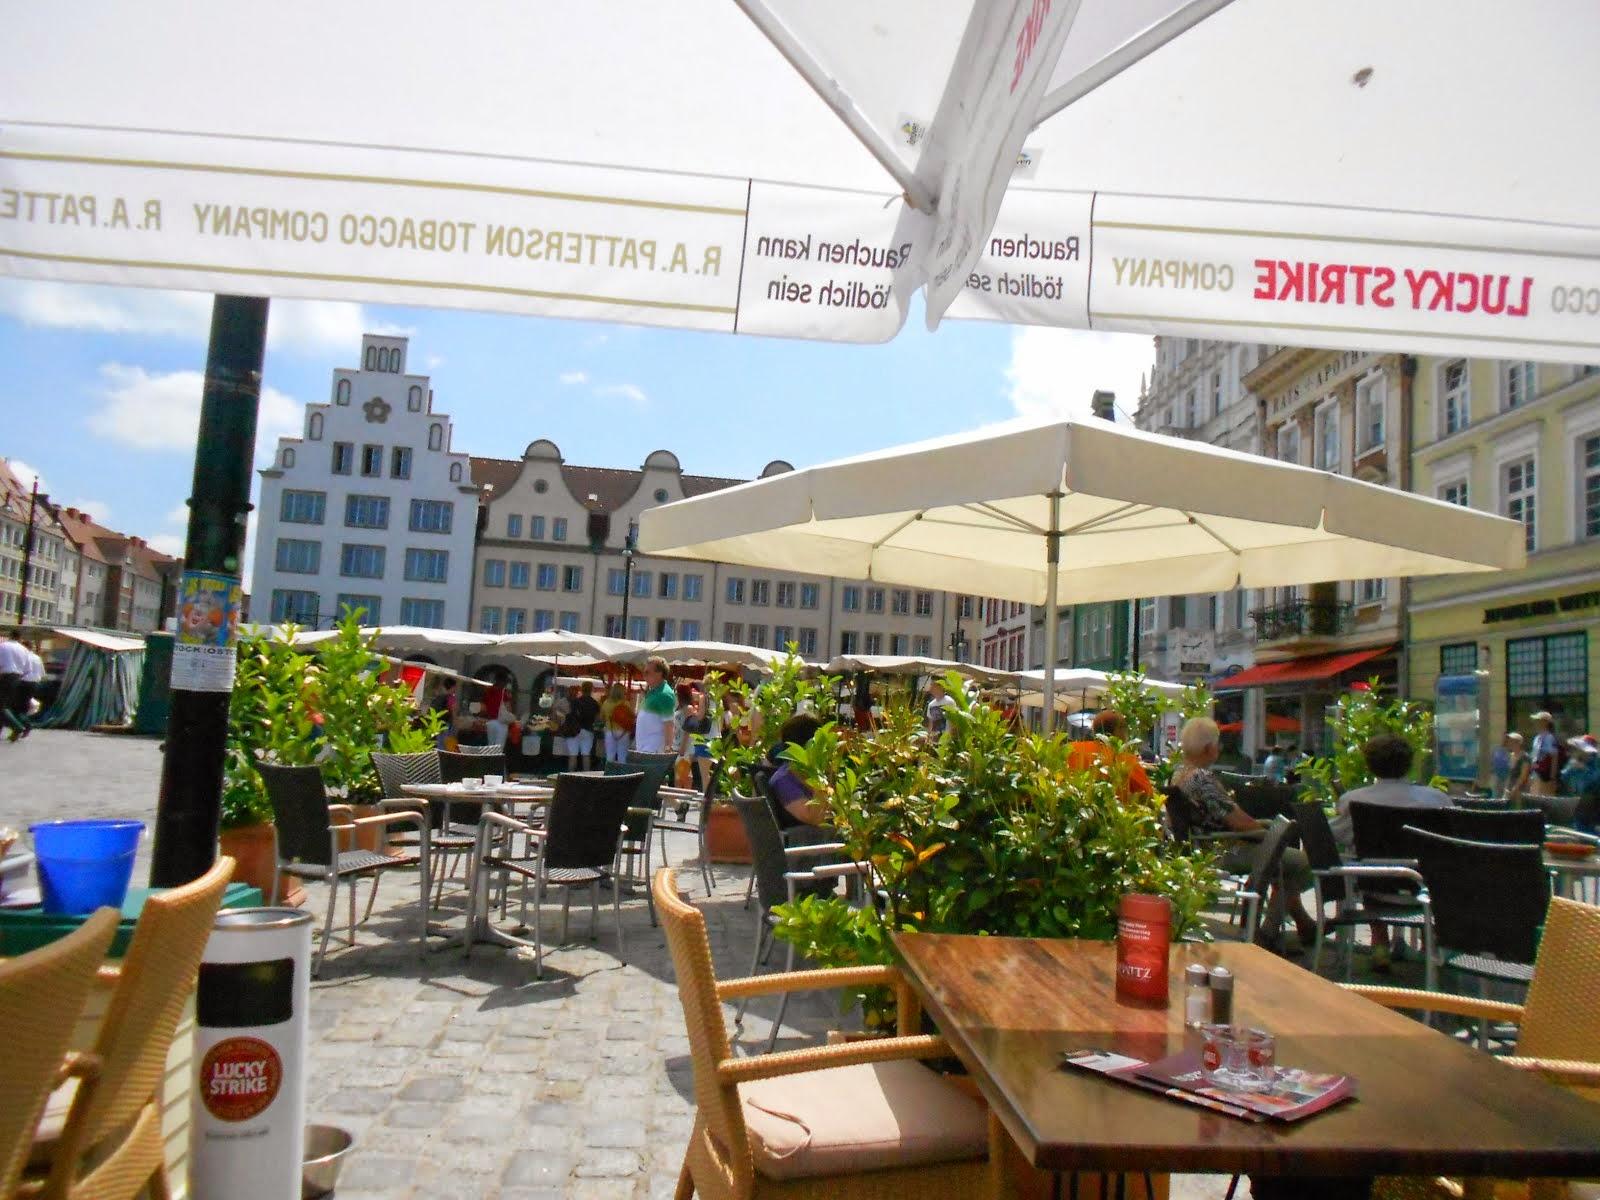 Rostock, Alemanha